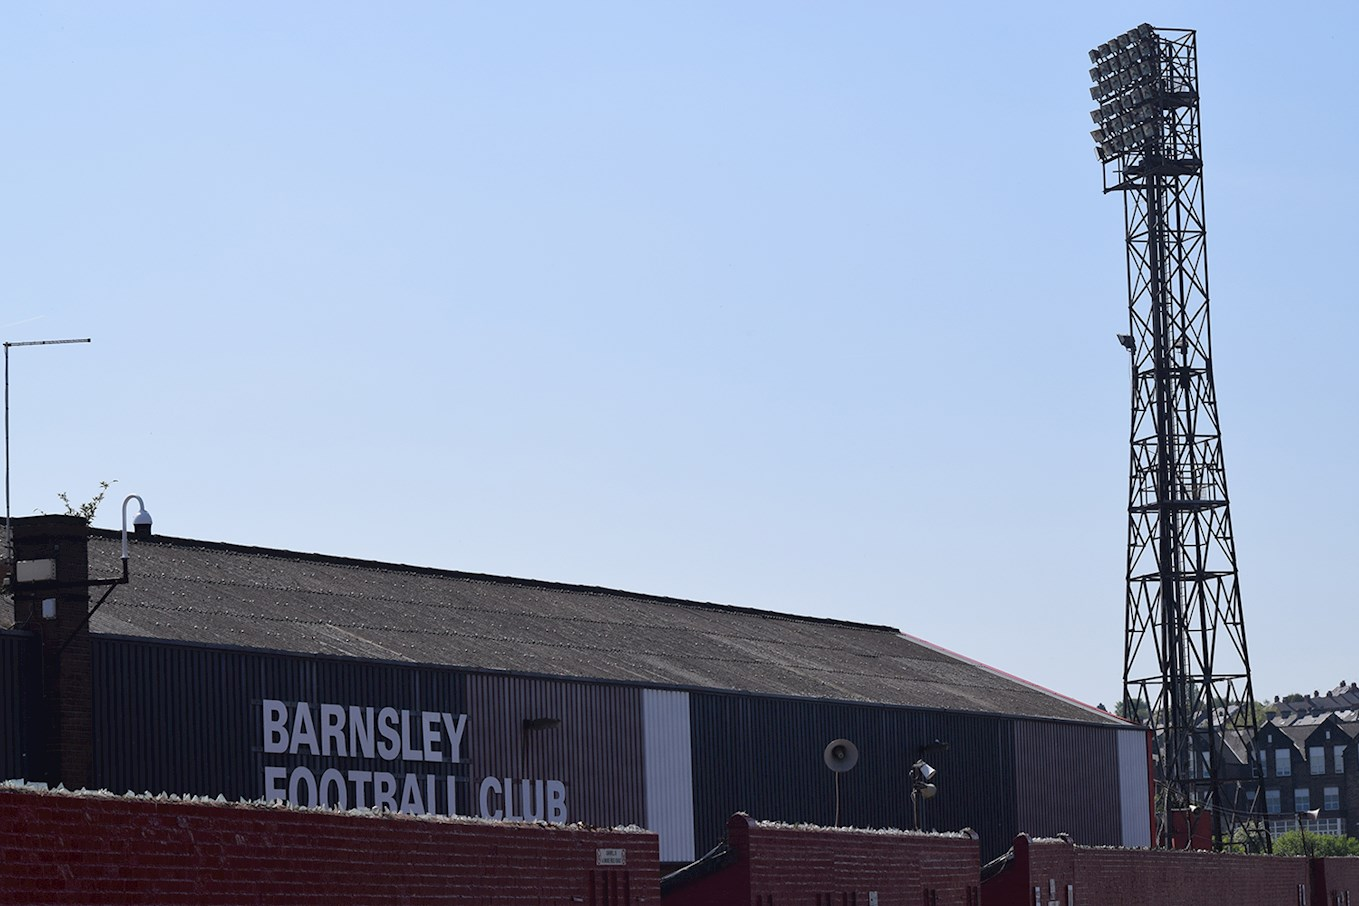 Oakwell Stadium Barnsley Football Club